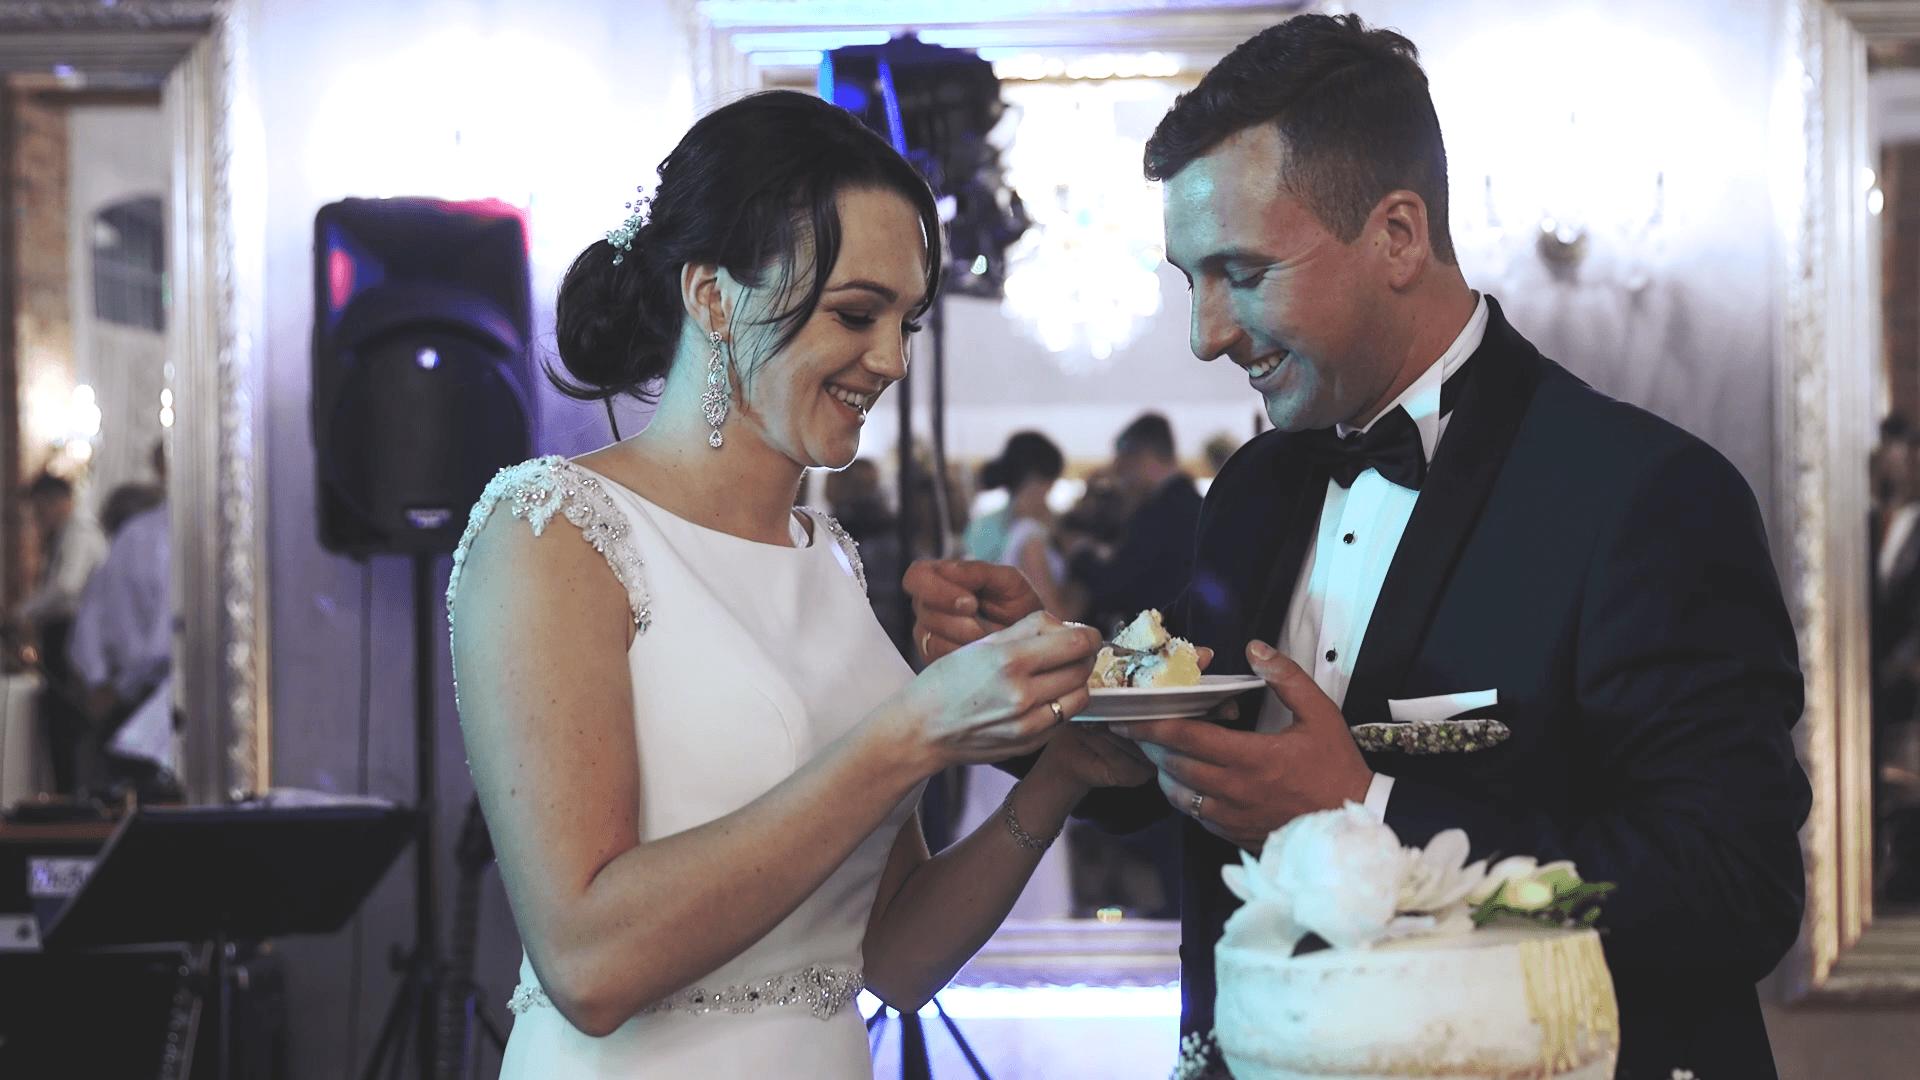 wesele młodzikowo